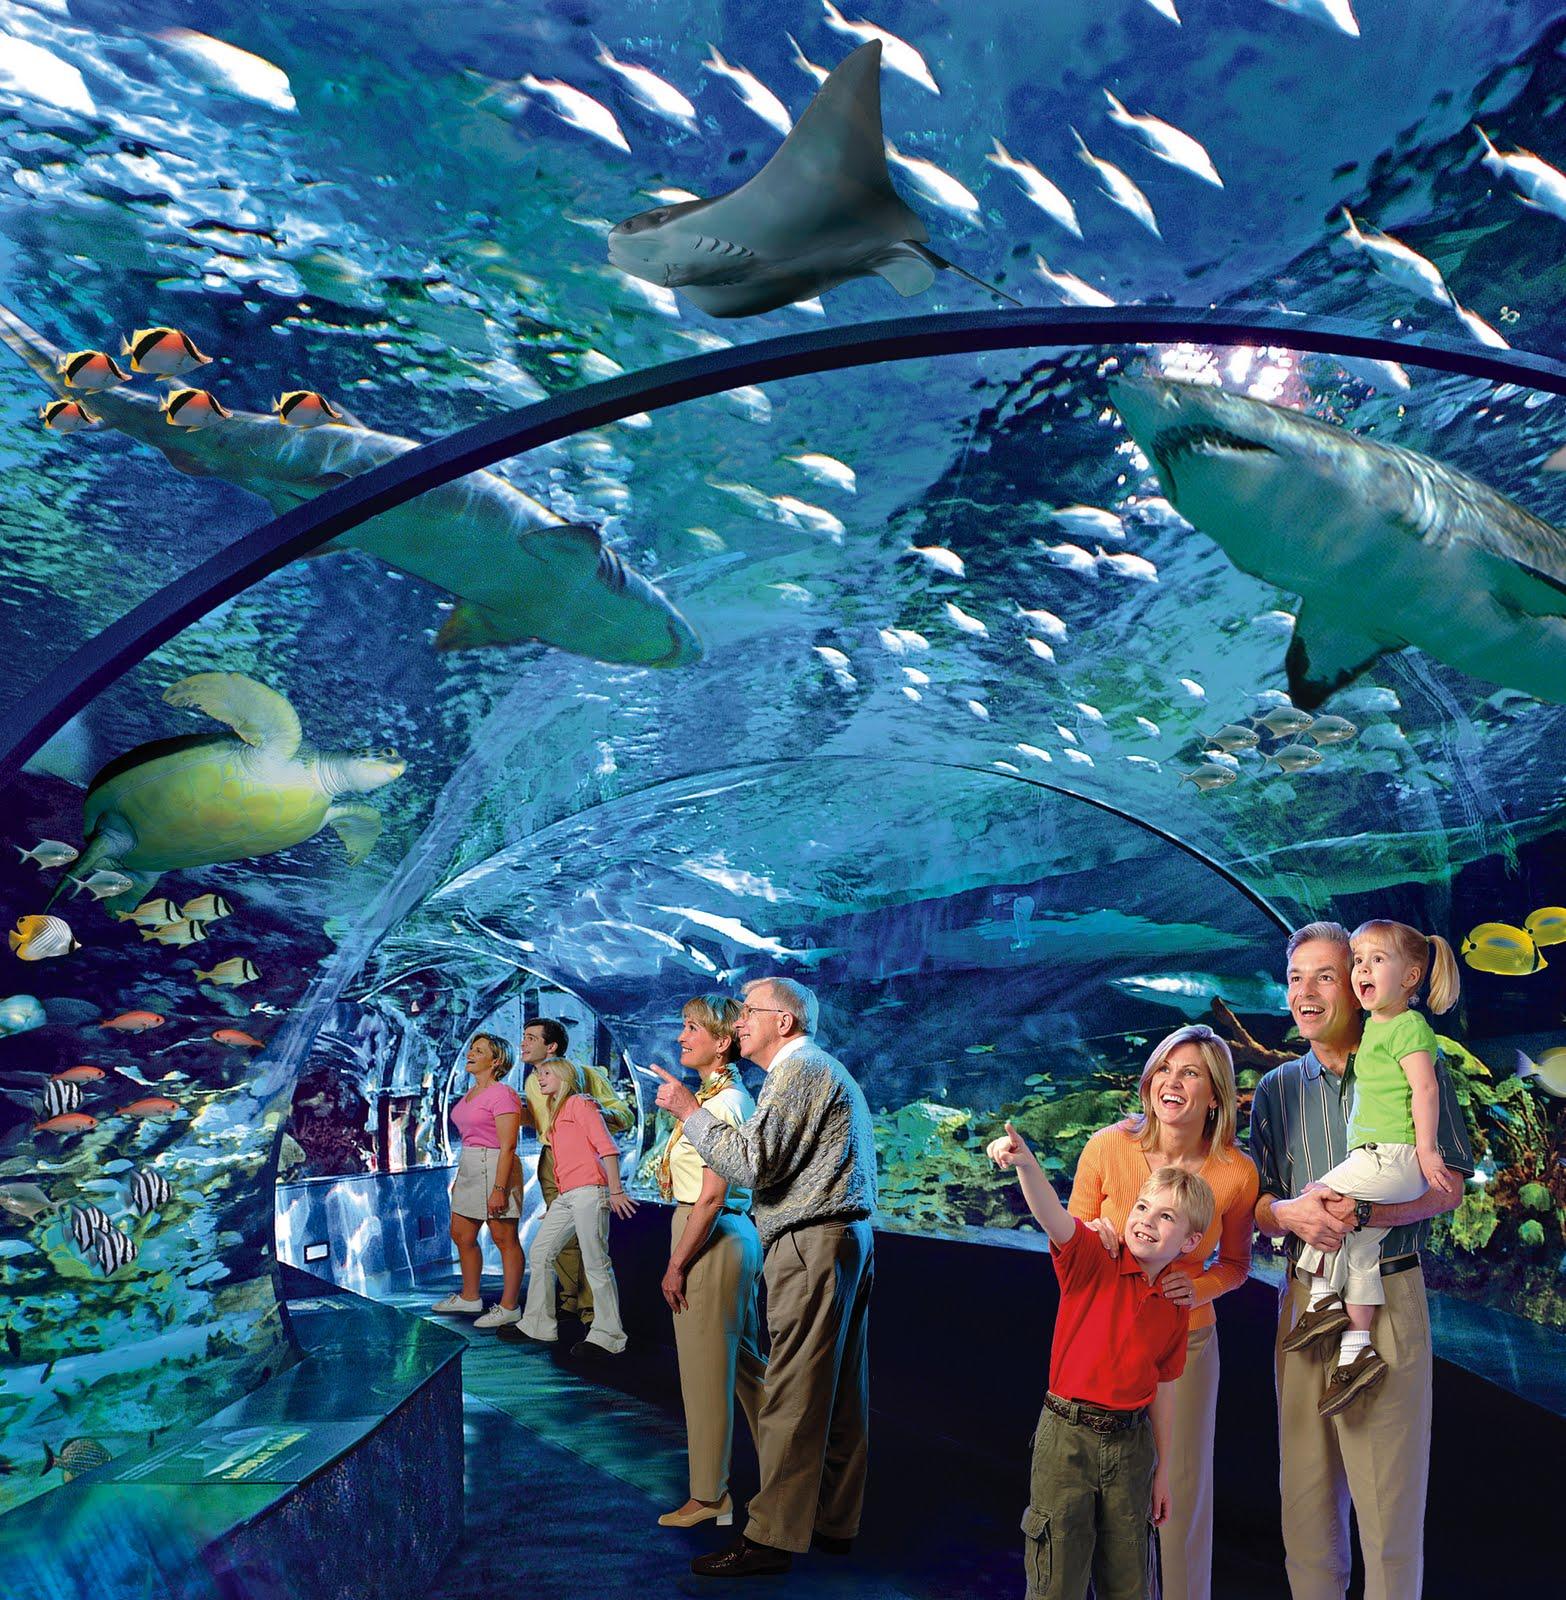 Believe it Not Toronto will soon have a Ripley s Aquarium